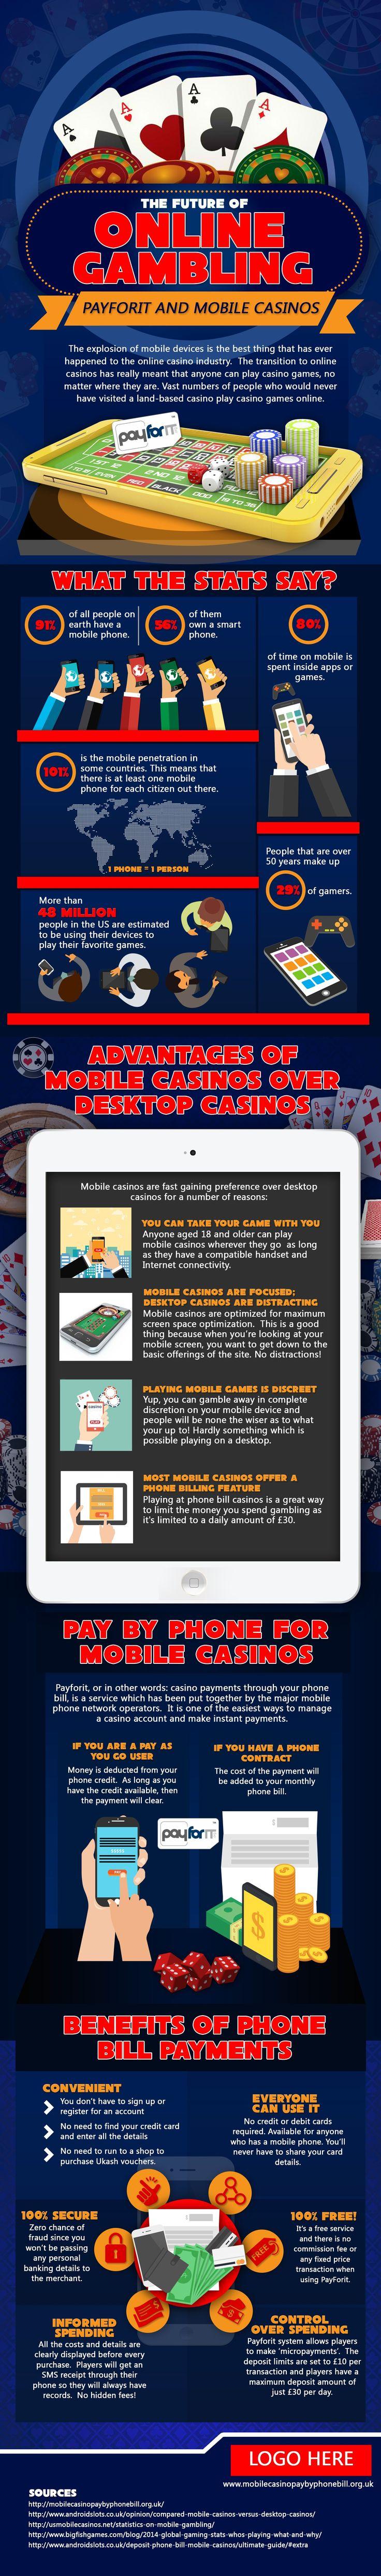 Casino Atlantic En Ligne Canadien